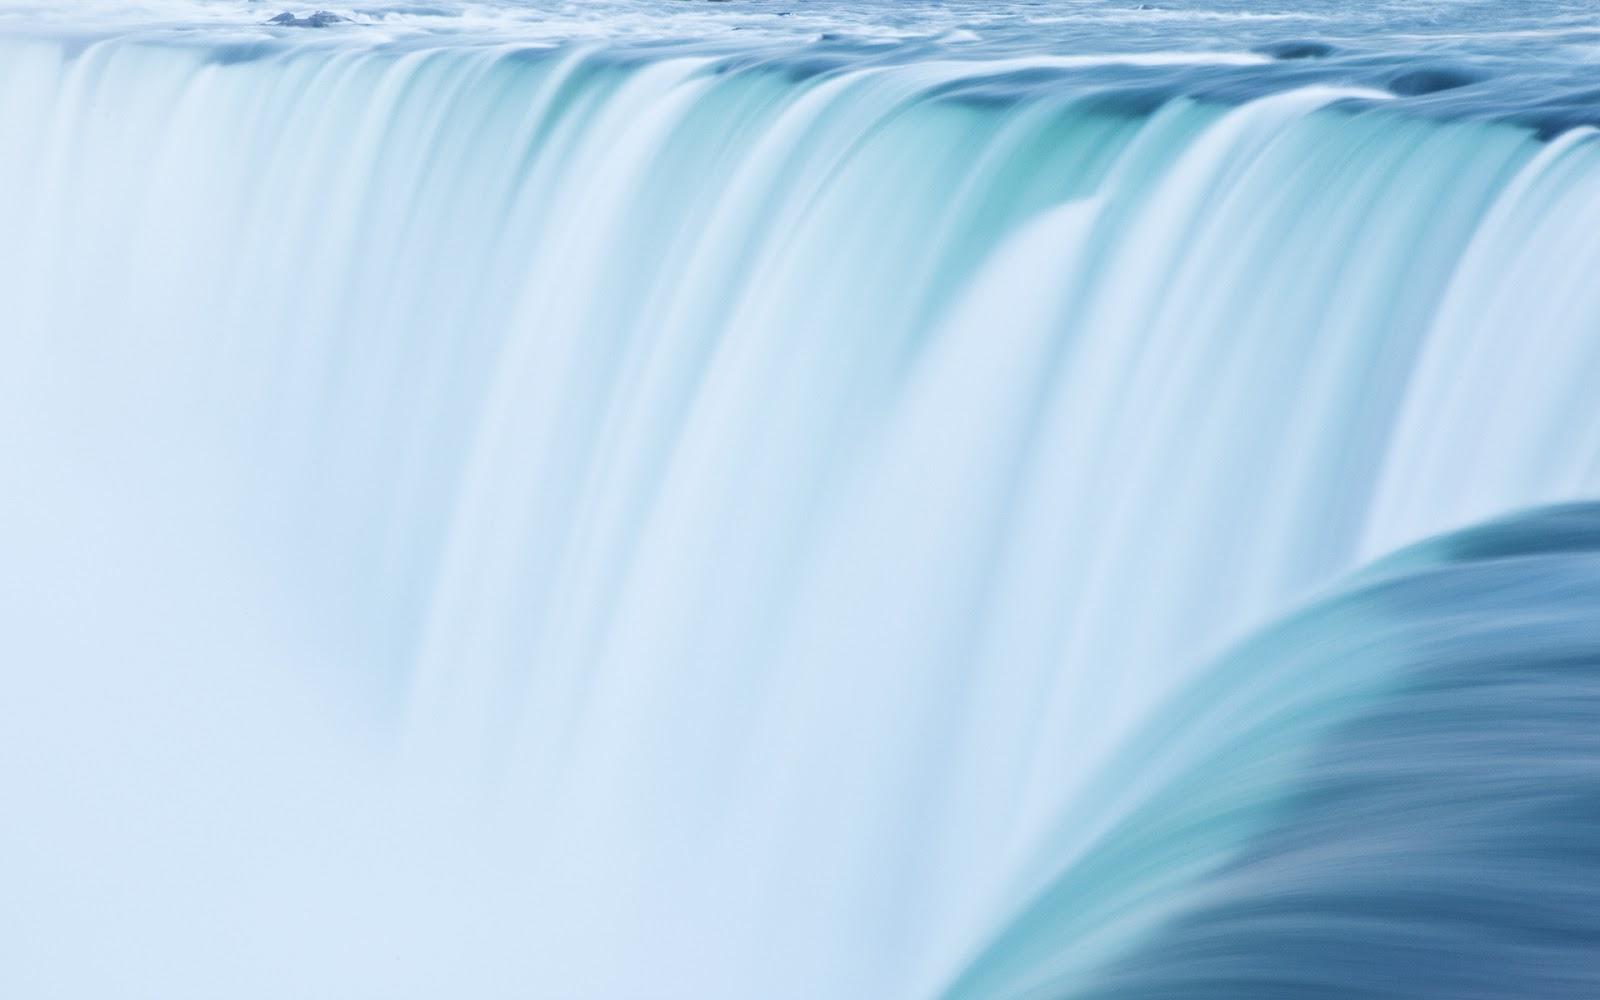 Niagara Falls Waterfall Wallpaper Fundo De Tela Lindas Imagens Bau Cintilante